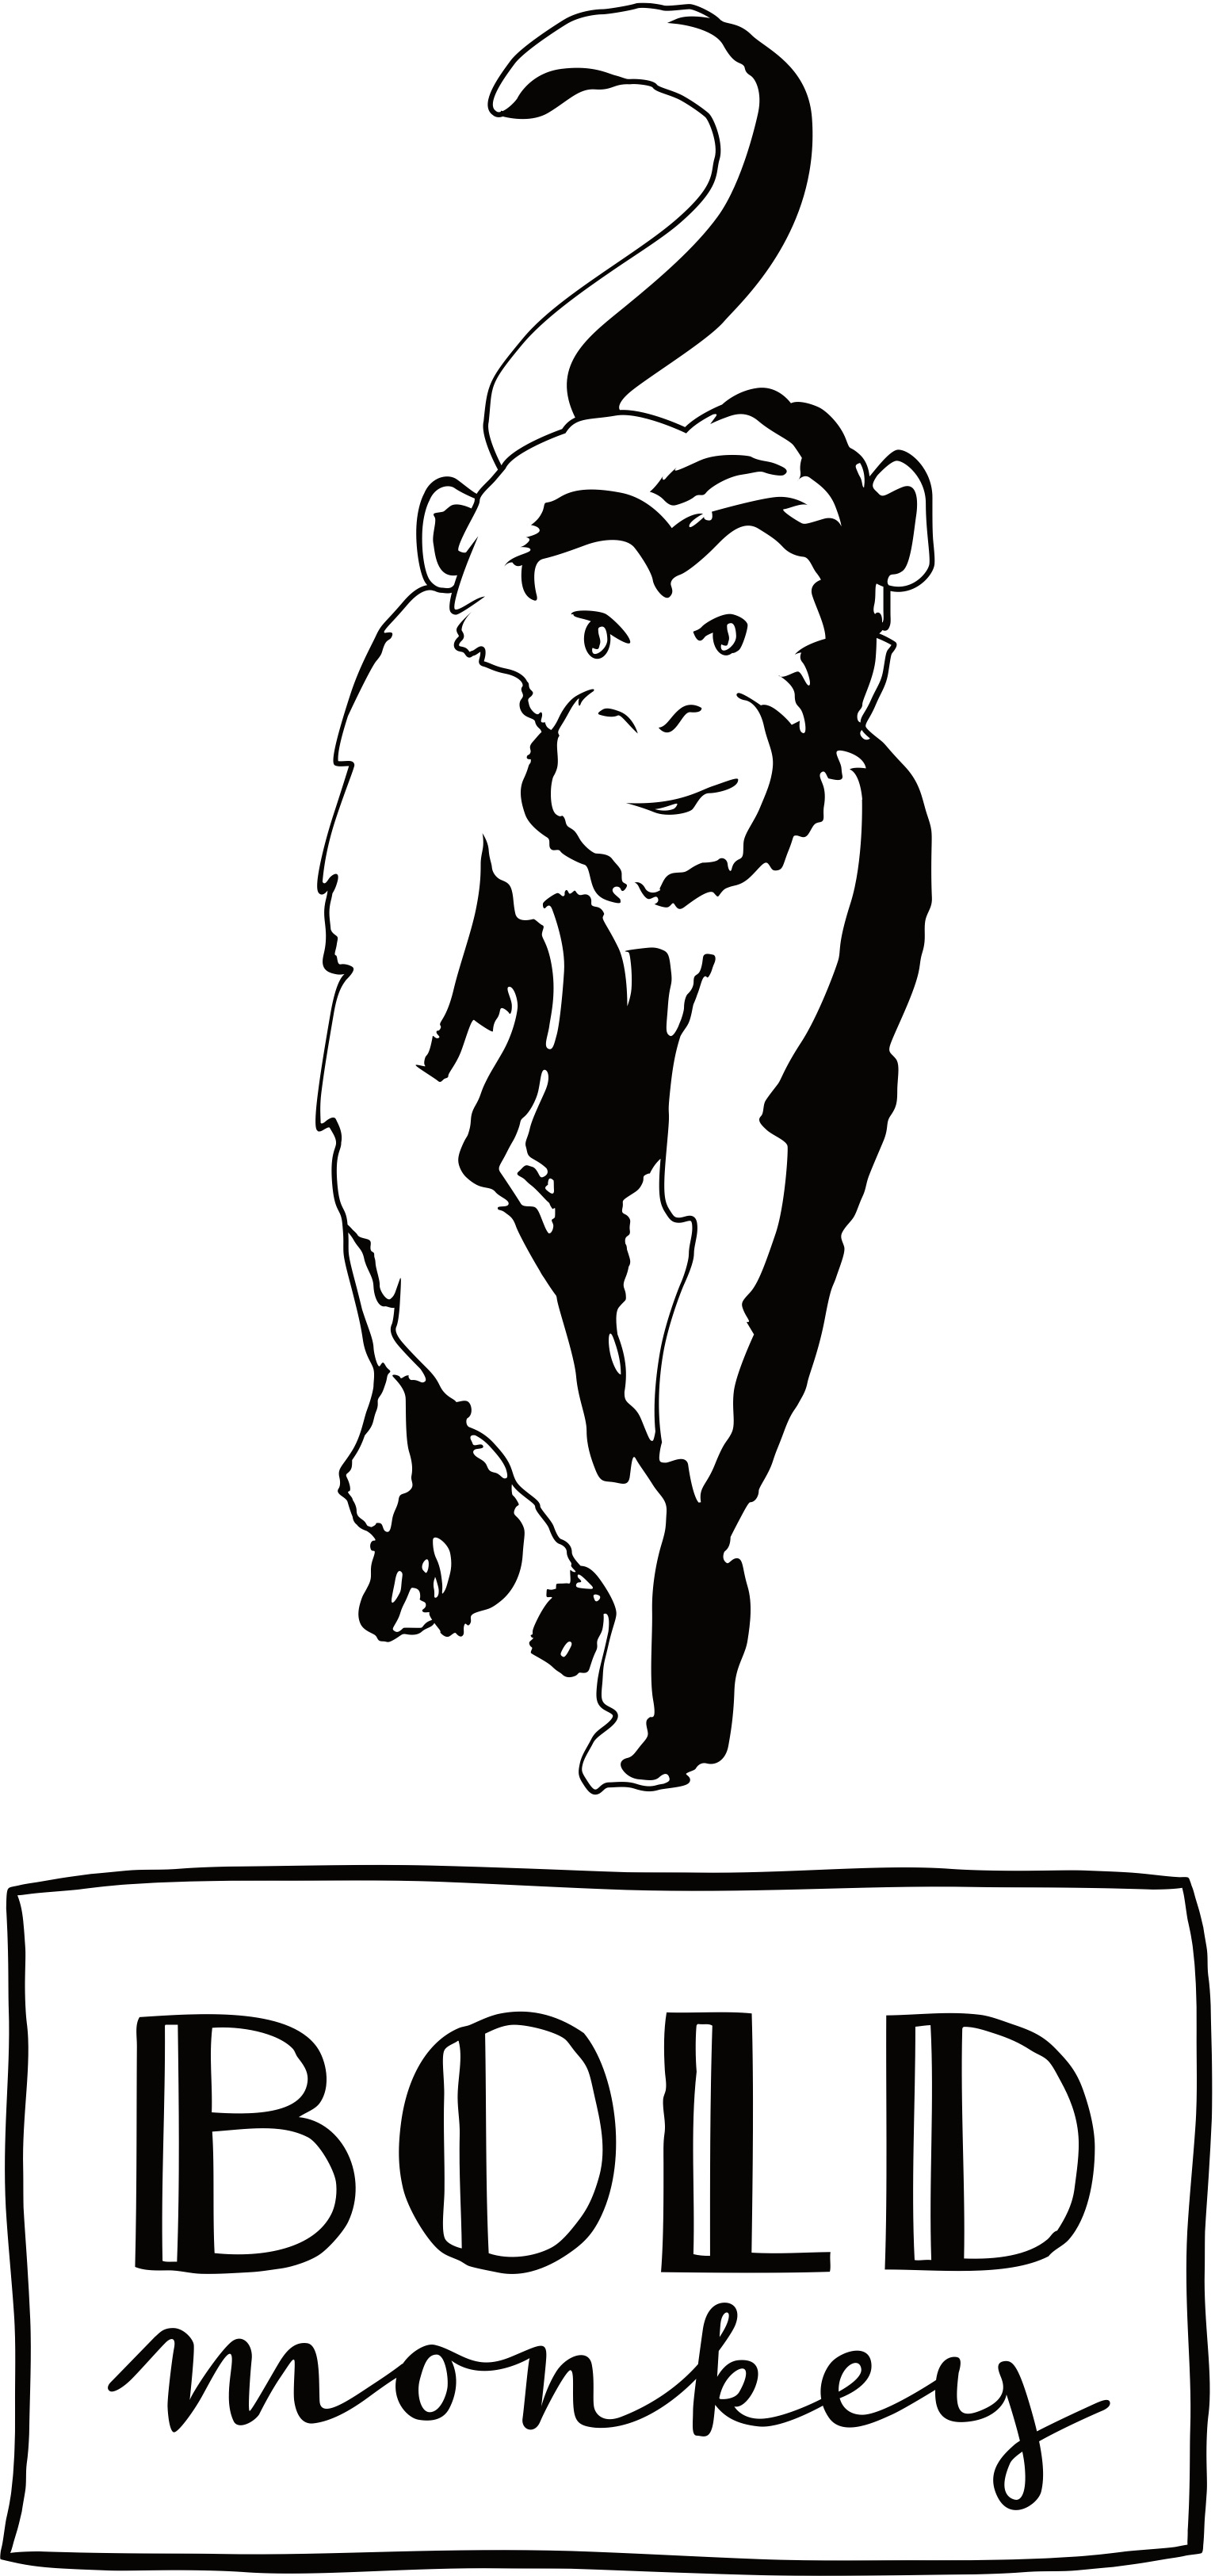 Bold Monkey i am not a macaron lage barkruk counter kookeiland kruk velvet roze gouden poten vooraanzicht